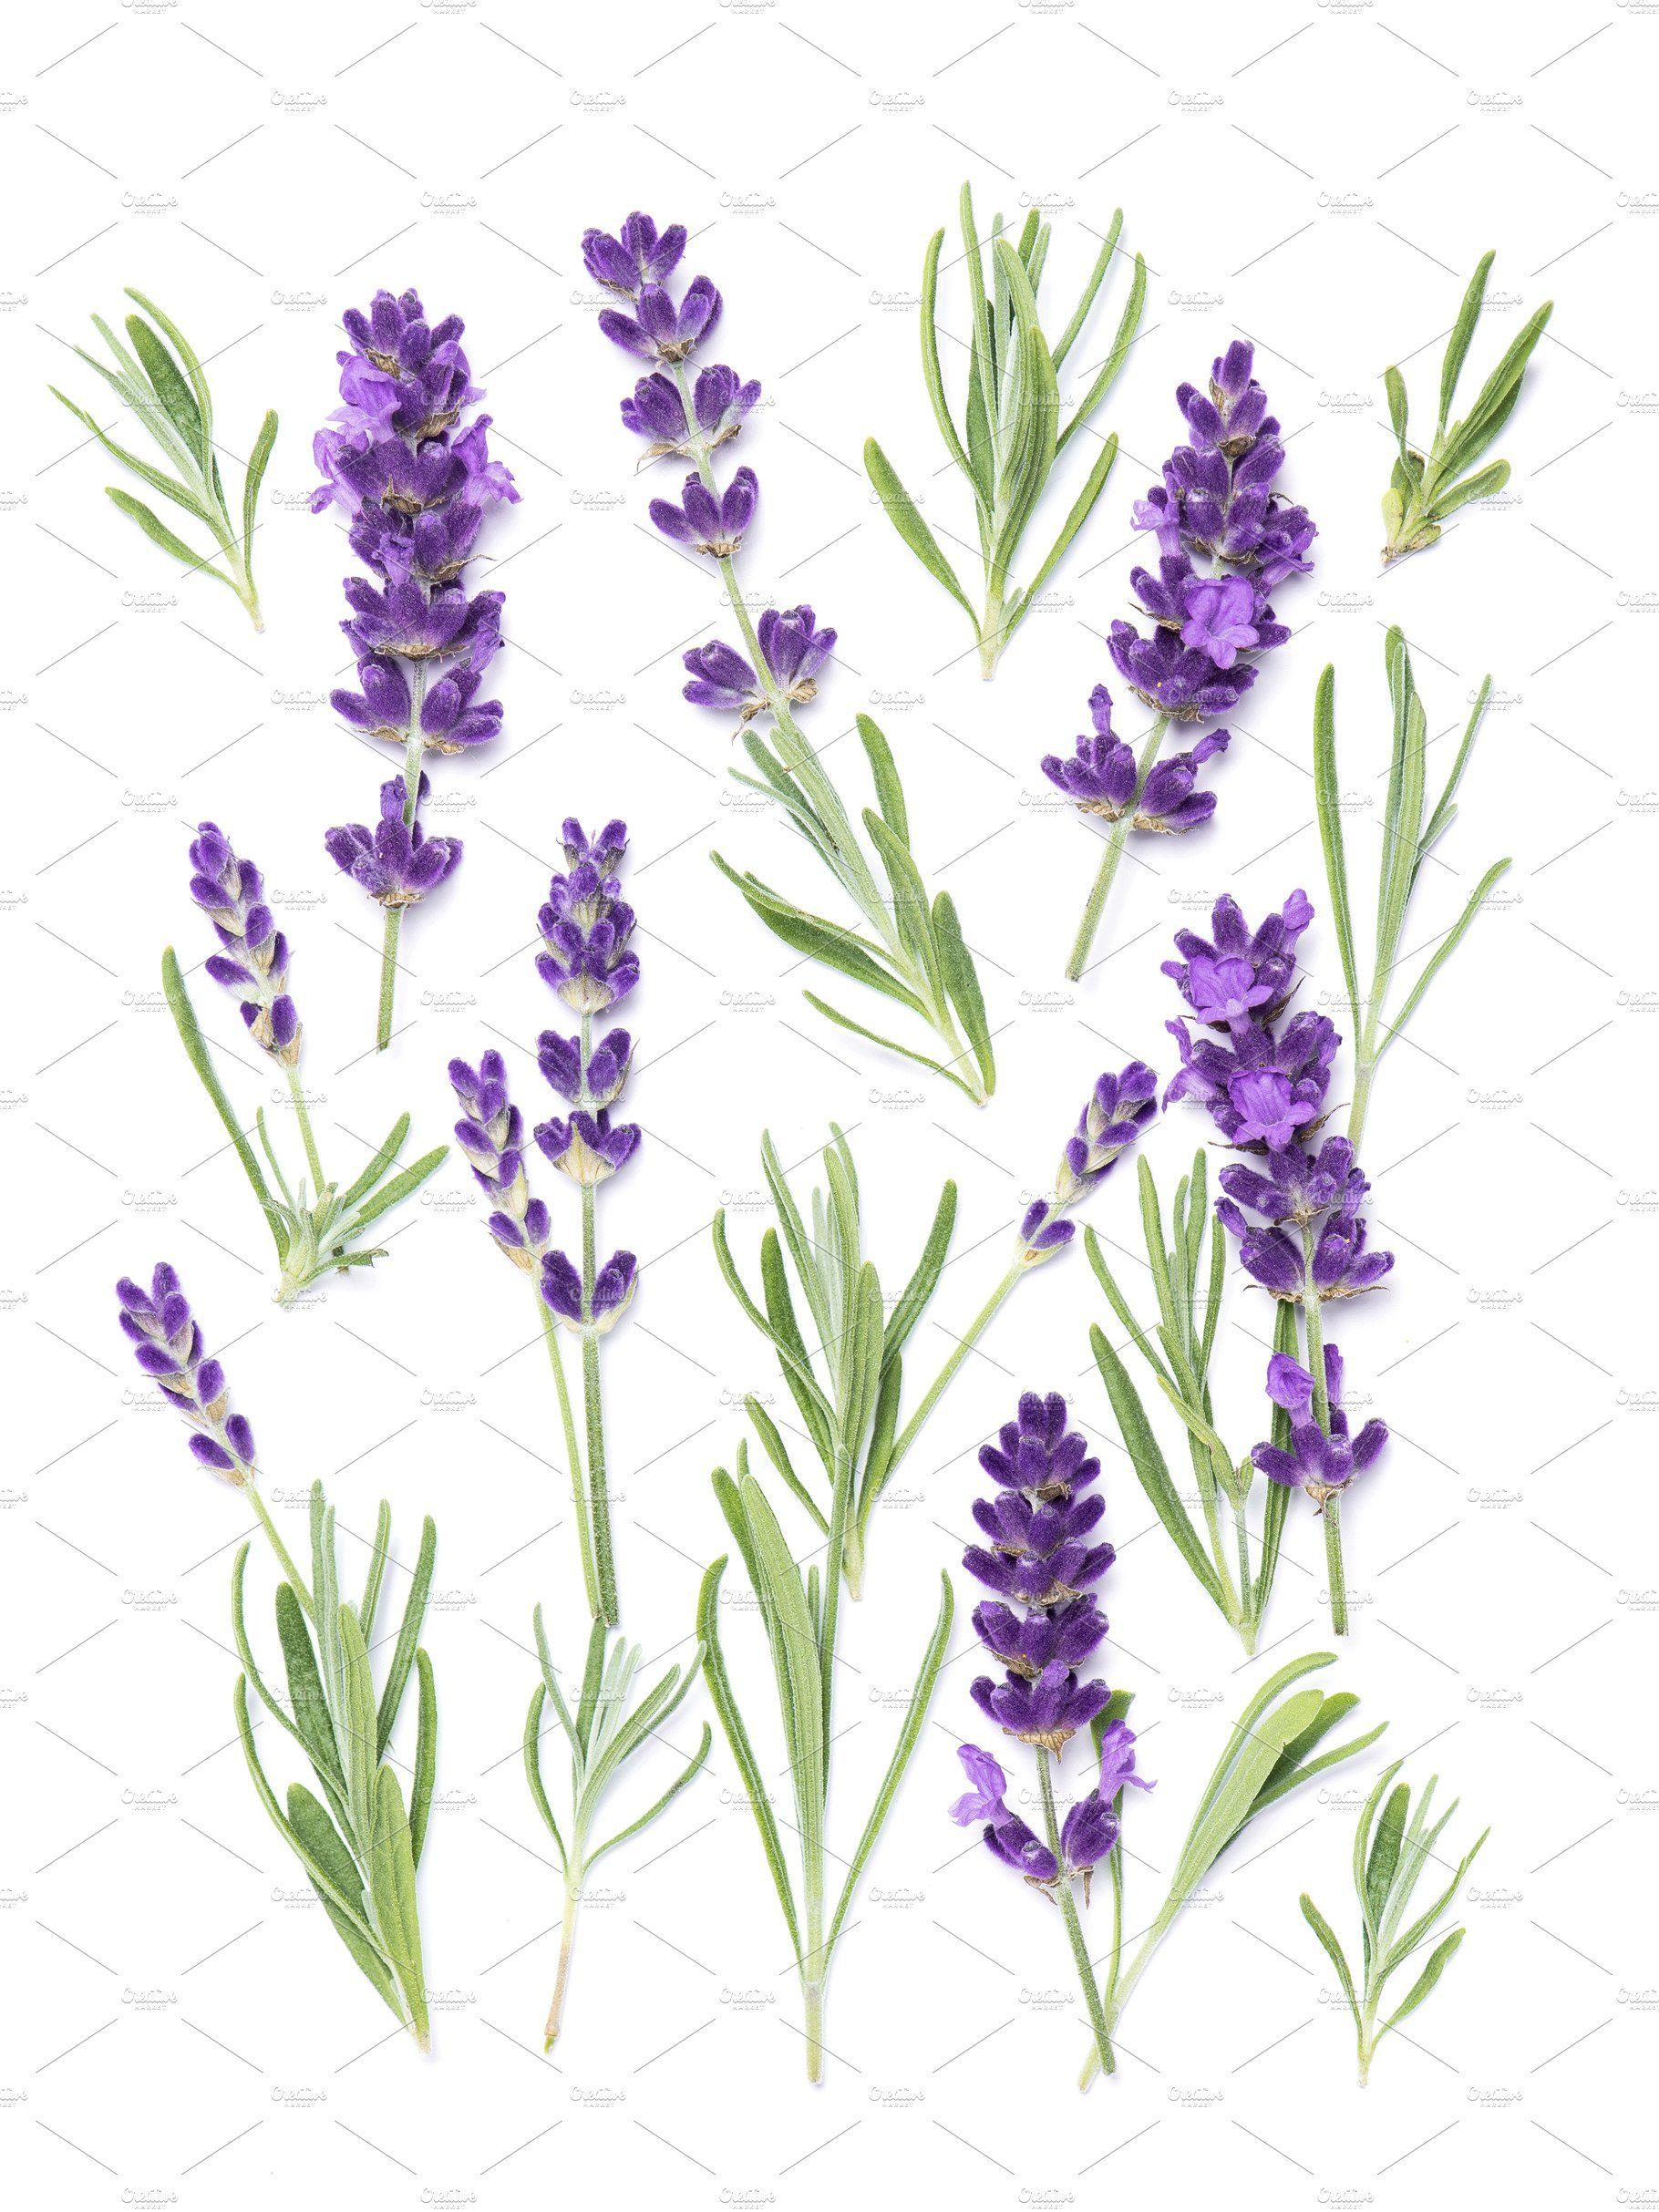 Lavender Flower Herb Background In 2020 Lavender Flowers Flower Pictures Flowers